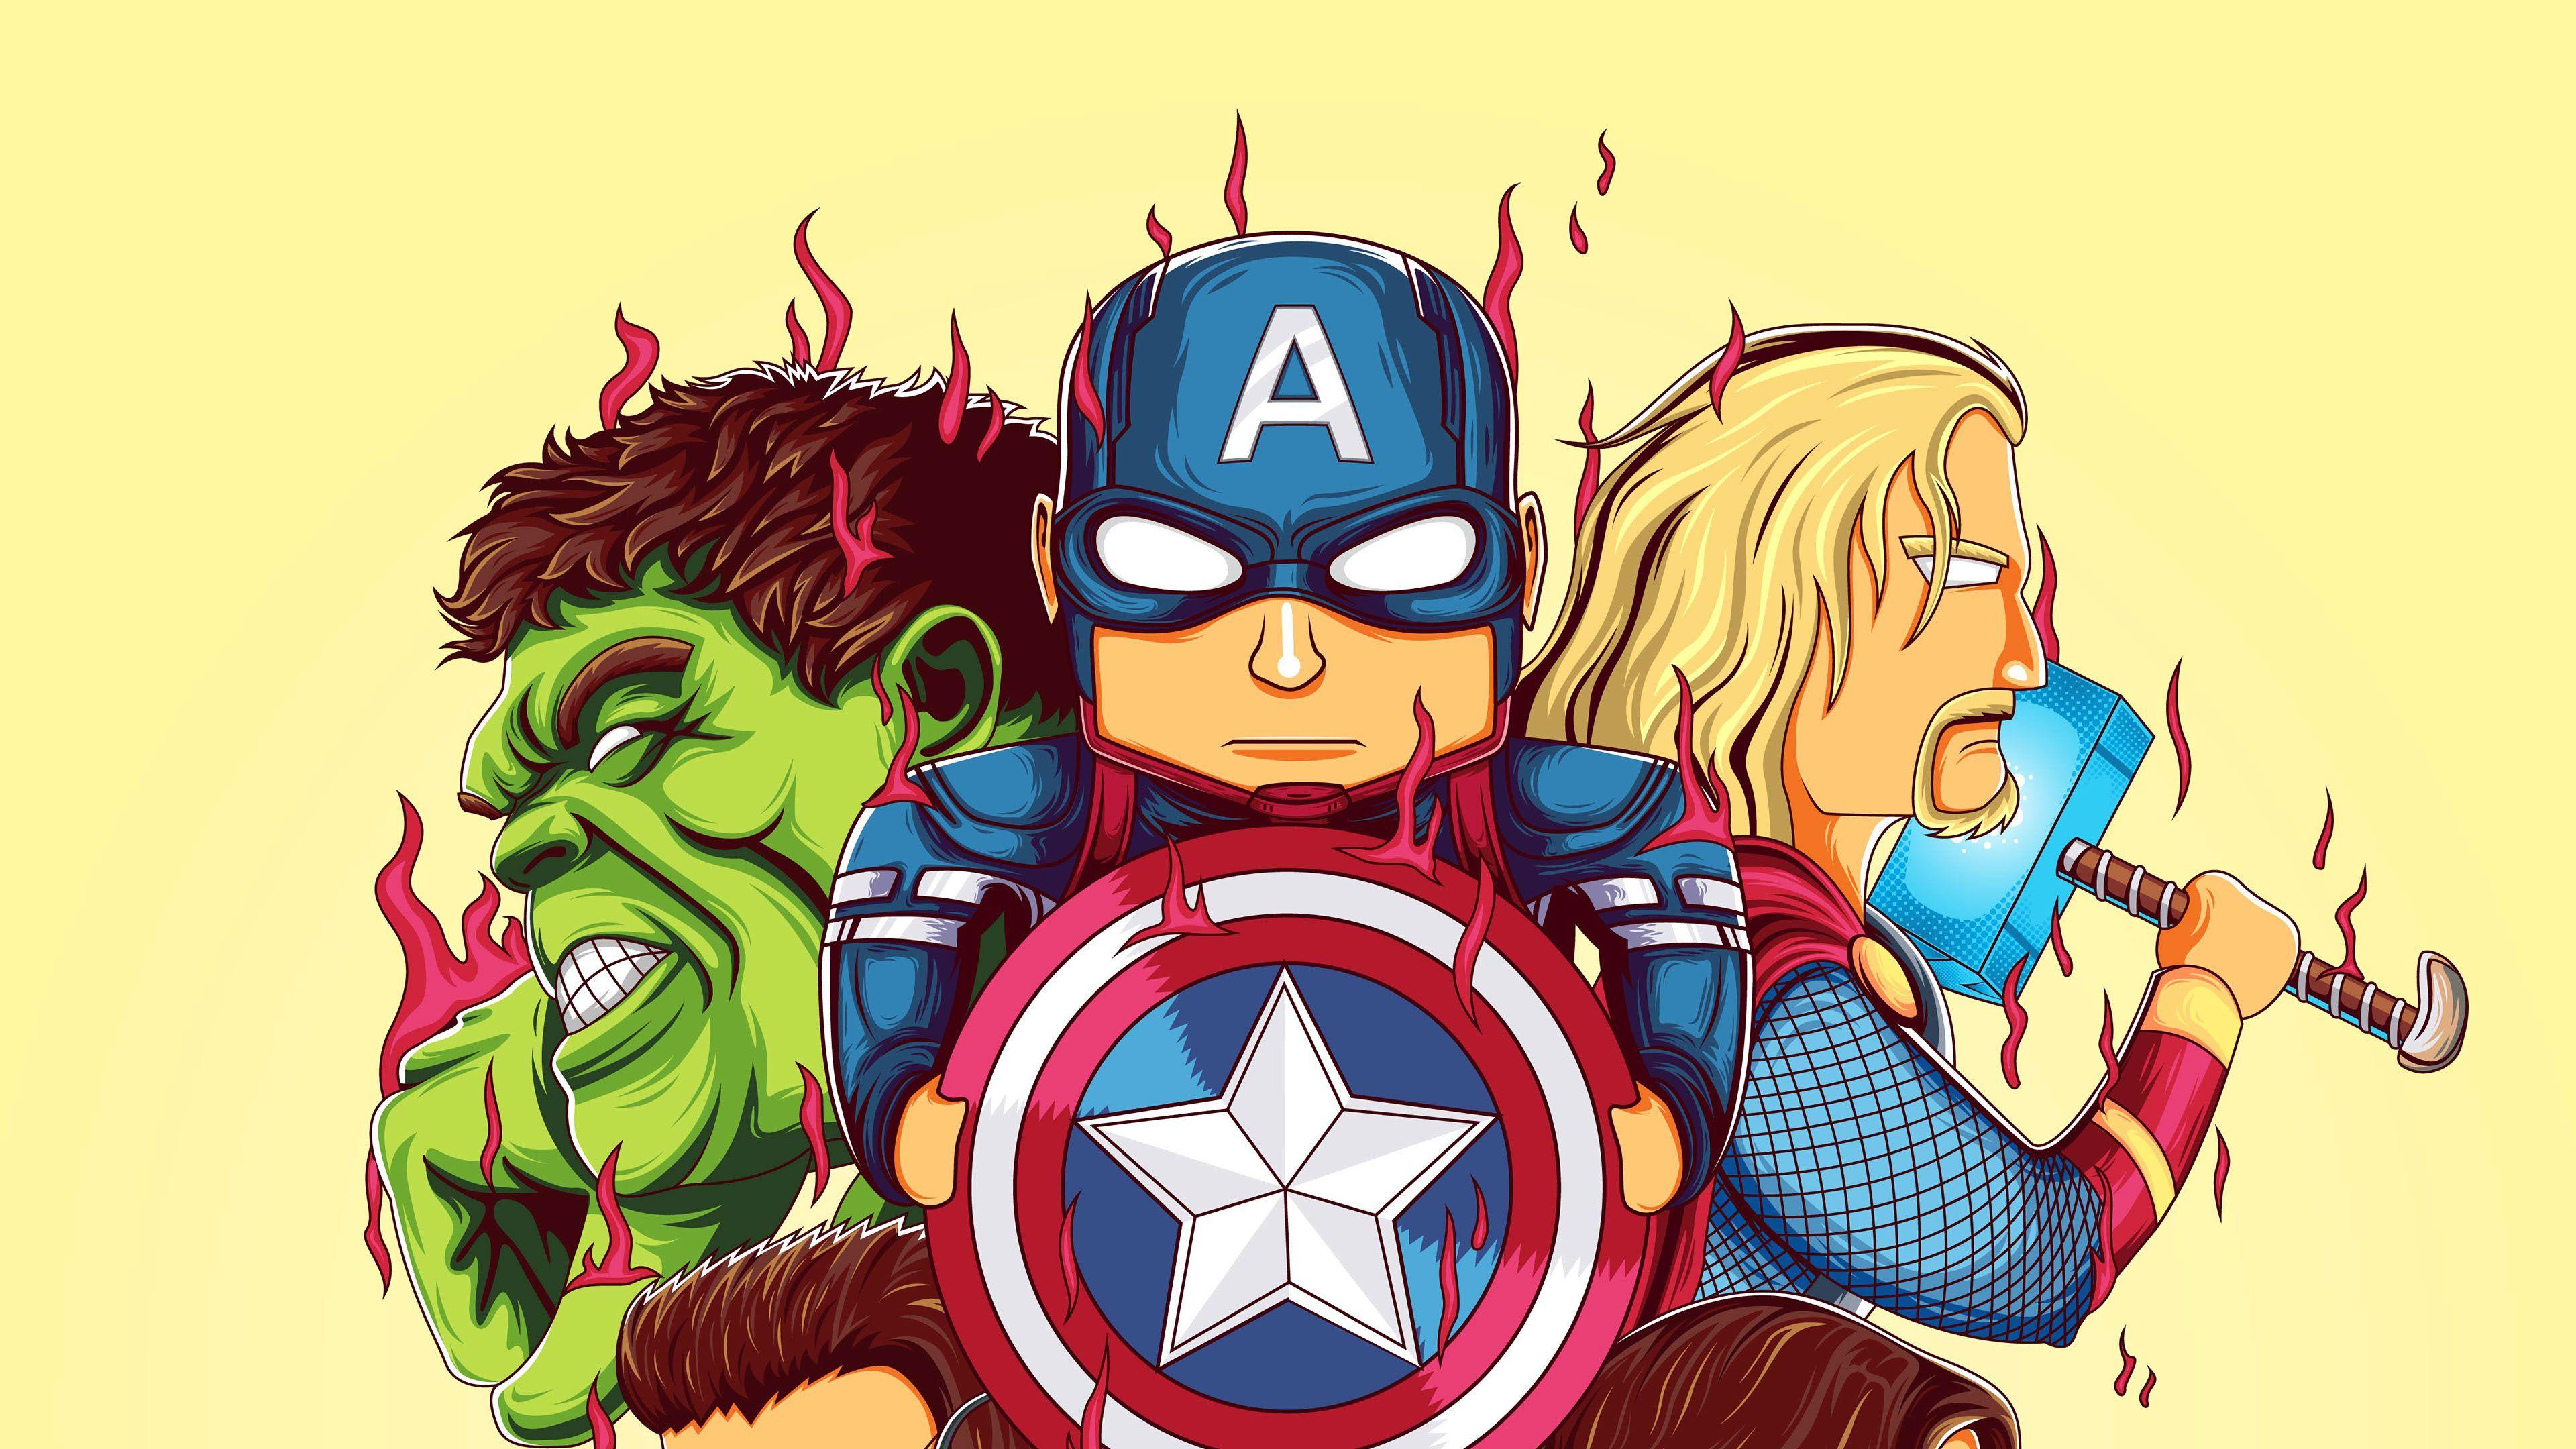 Little Avengers 4k Thor Wallpapers Superheroes Wallpapers Hulk Wallpapers Hd Wallpapers Digital Captain America Wallpaper Thor Wallpaper Avengers Wallpaper